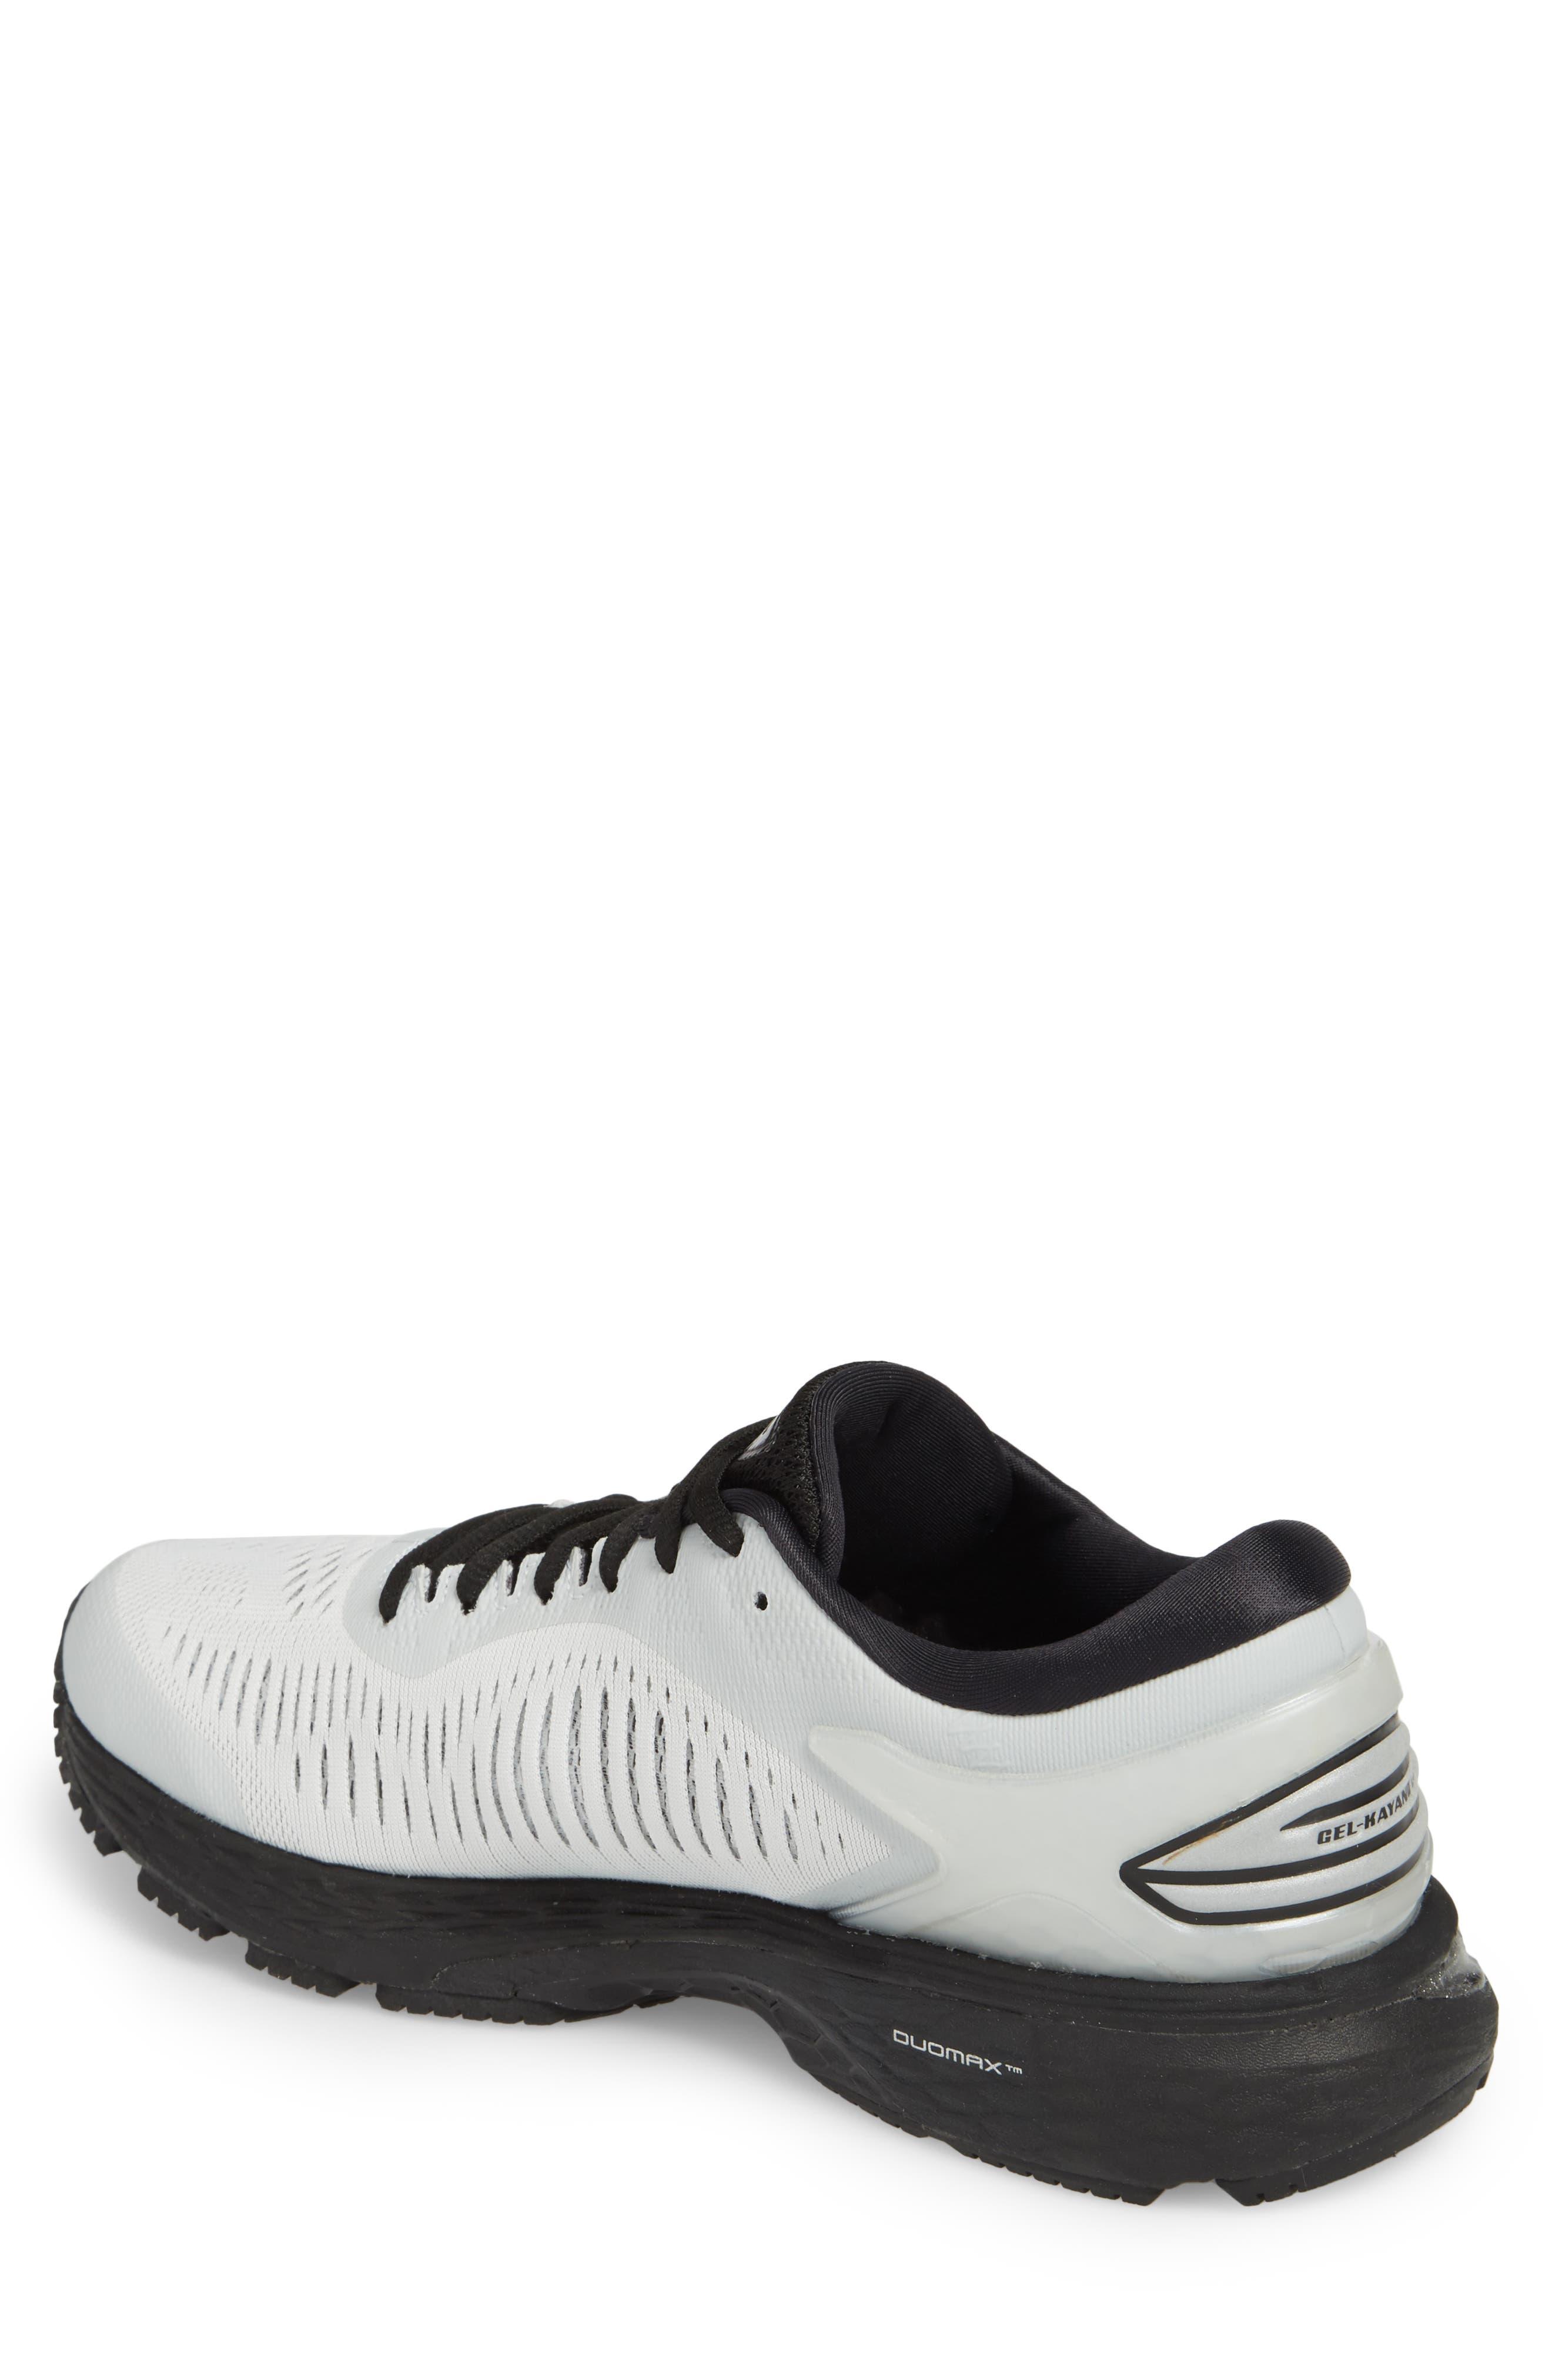 GEL-Kayano<sup>®</sup> 25 Running Shoe,                             Alternate thumbnail 2, color,                             GLACIER GREY/ BLACK